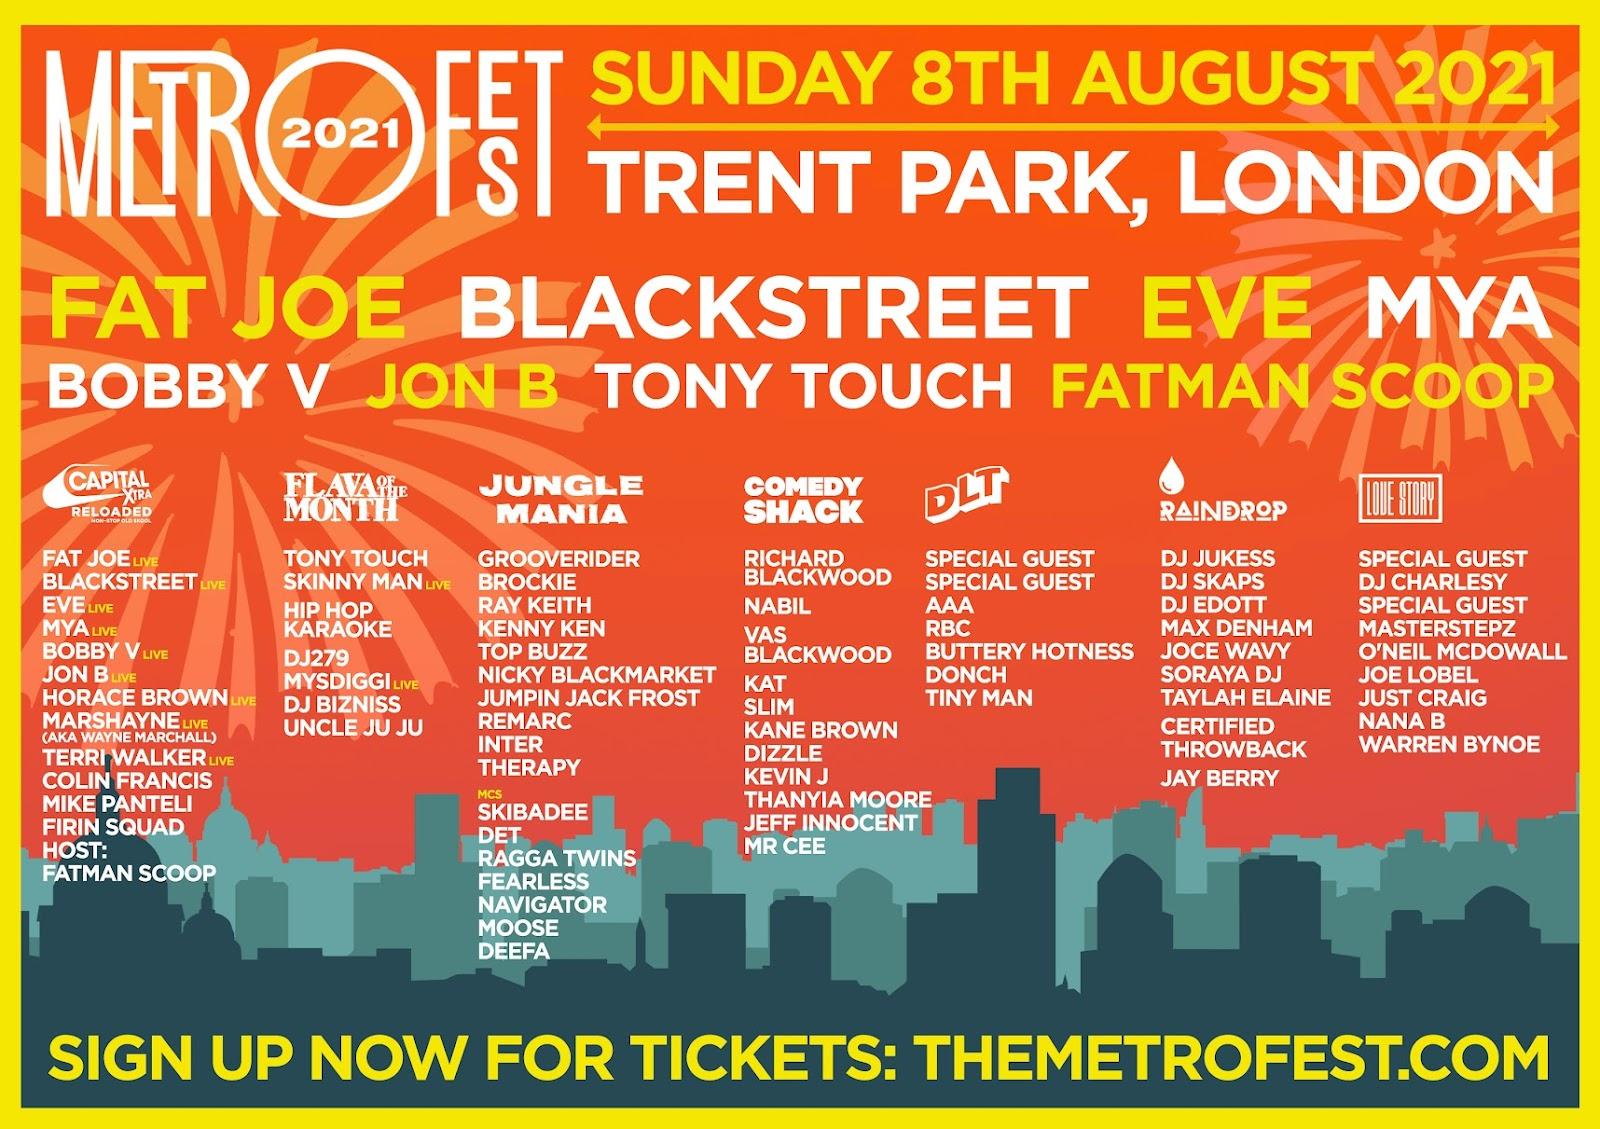 Metrofest